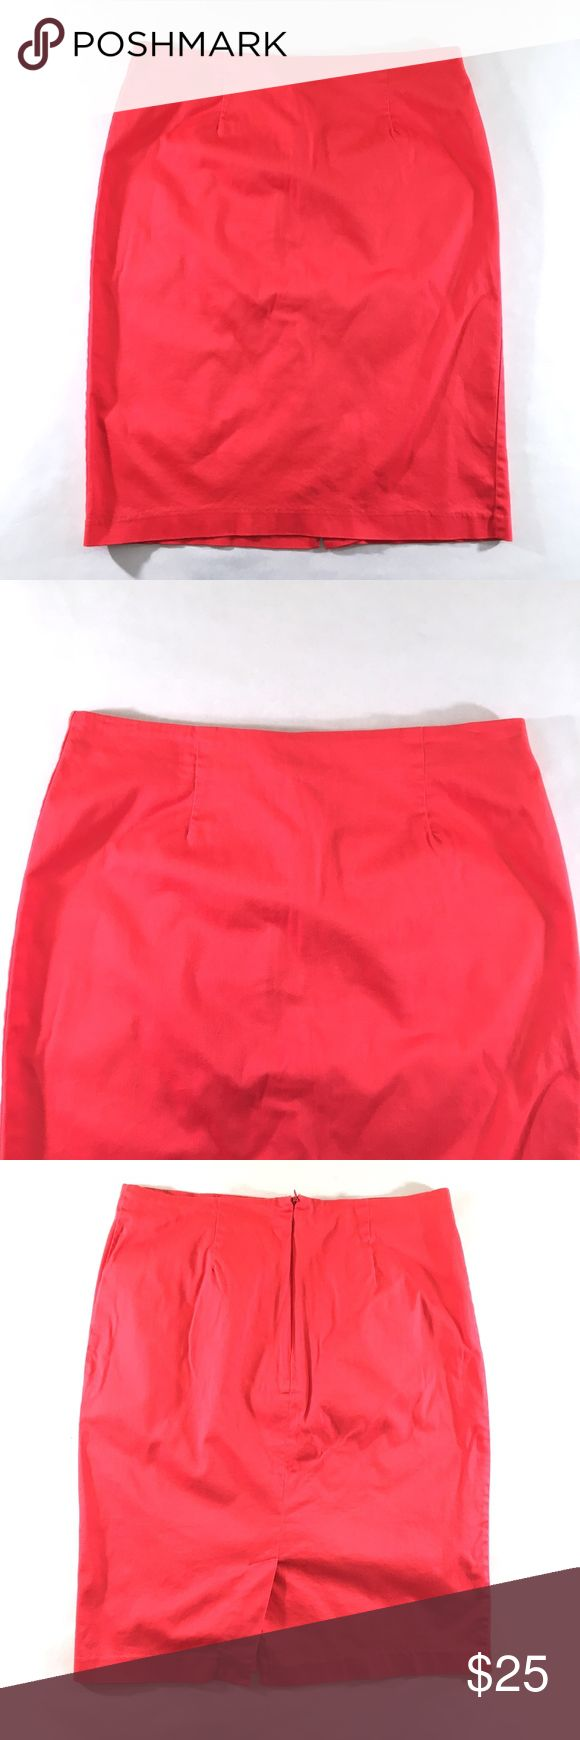 "Sunny Leigh Coral Pencil Skirt (10) 🔹97% Cotton, 3% Spandex 🔹Back zipper w/ hook & eye closure 🔹Waist: 32"" (16"" laid flat) 🔹Hips: 38"" (19"" laid flat) 🔹Length: 22"" 🔹Back slit: 5.75"" Sunny Leigh Skirts Pencil"